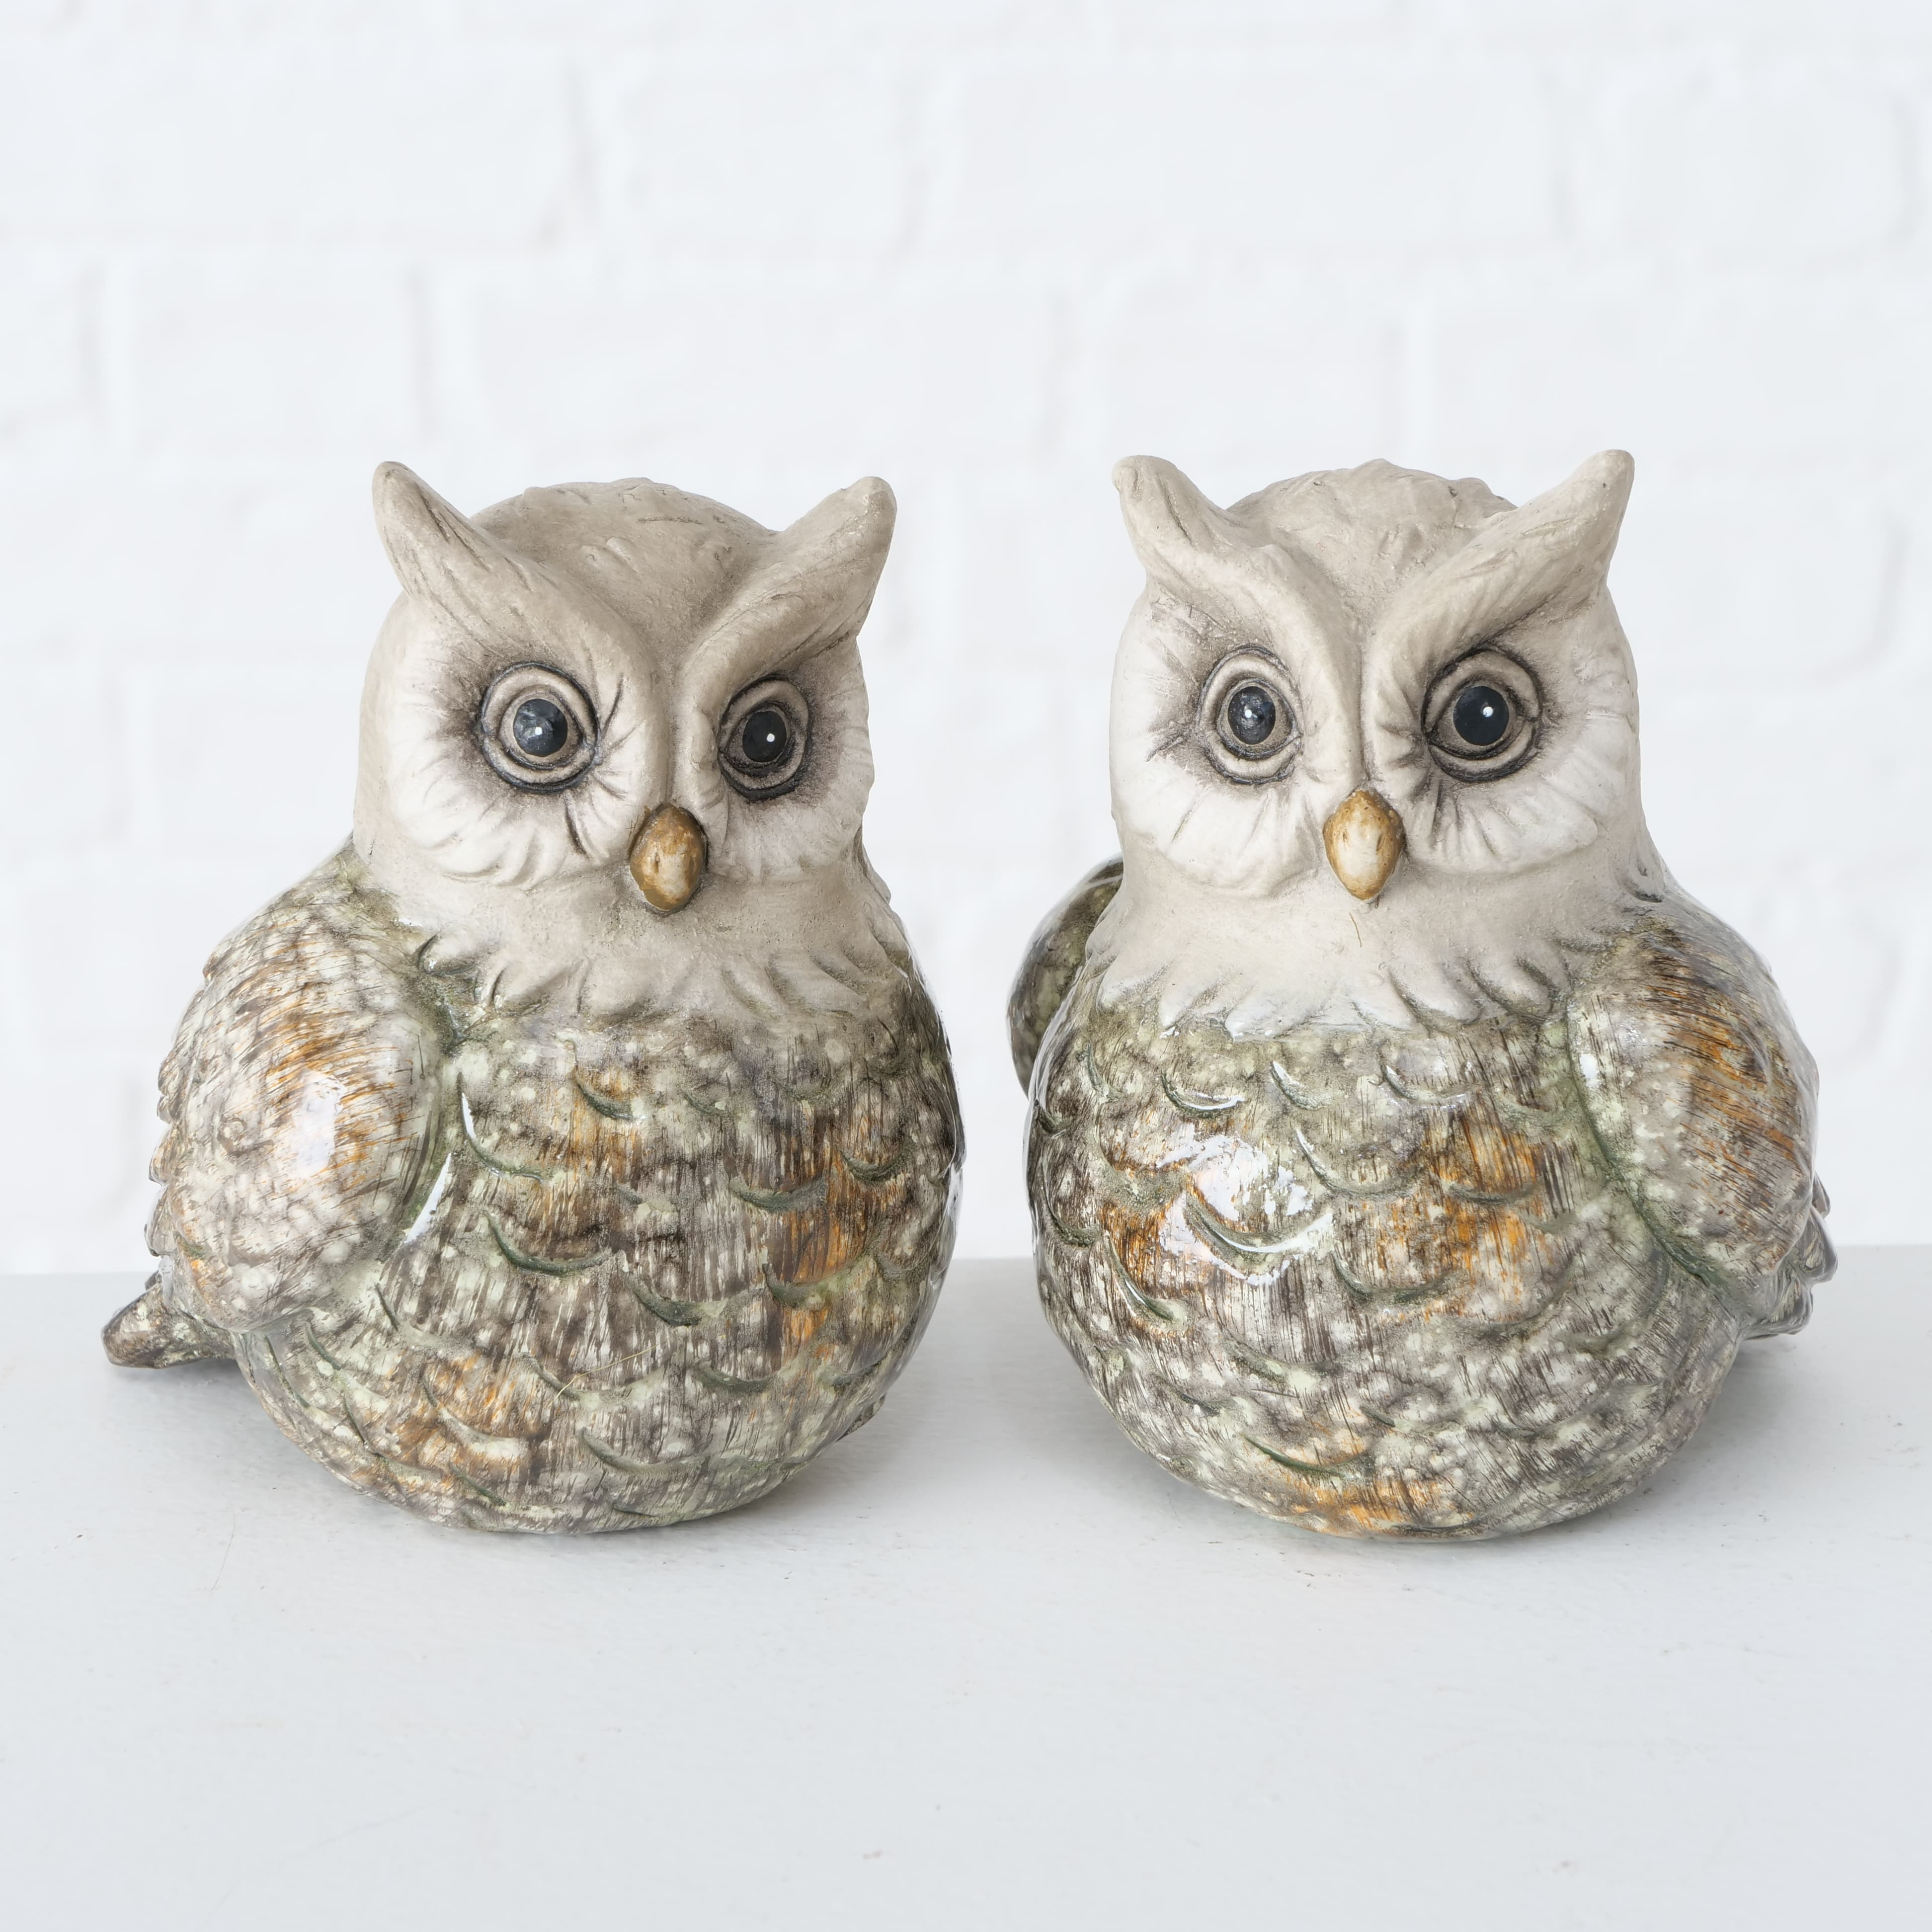 Decoratiune din ceramica Kuga Owl Multicolor, Modele Asortate, l10xA9xH11 cm